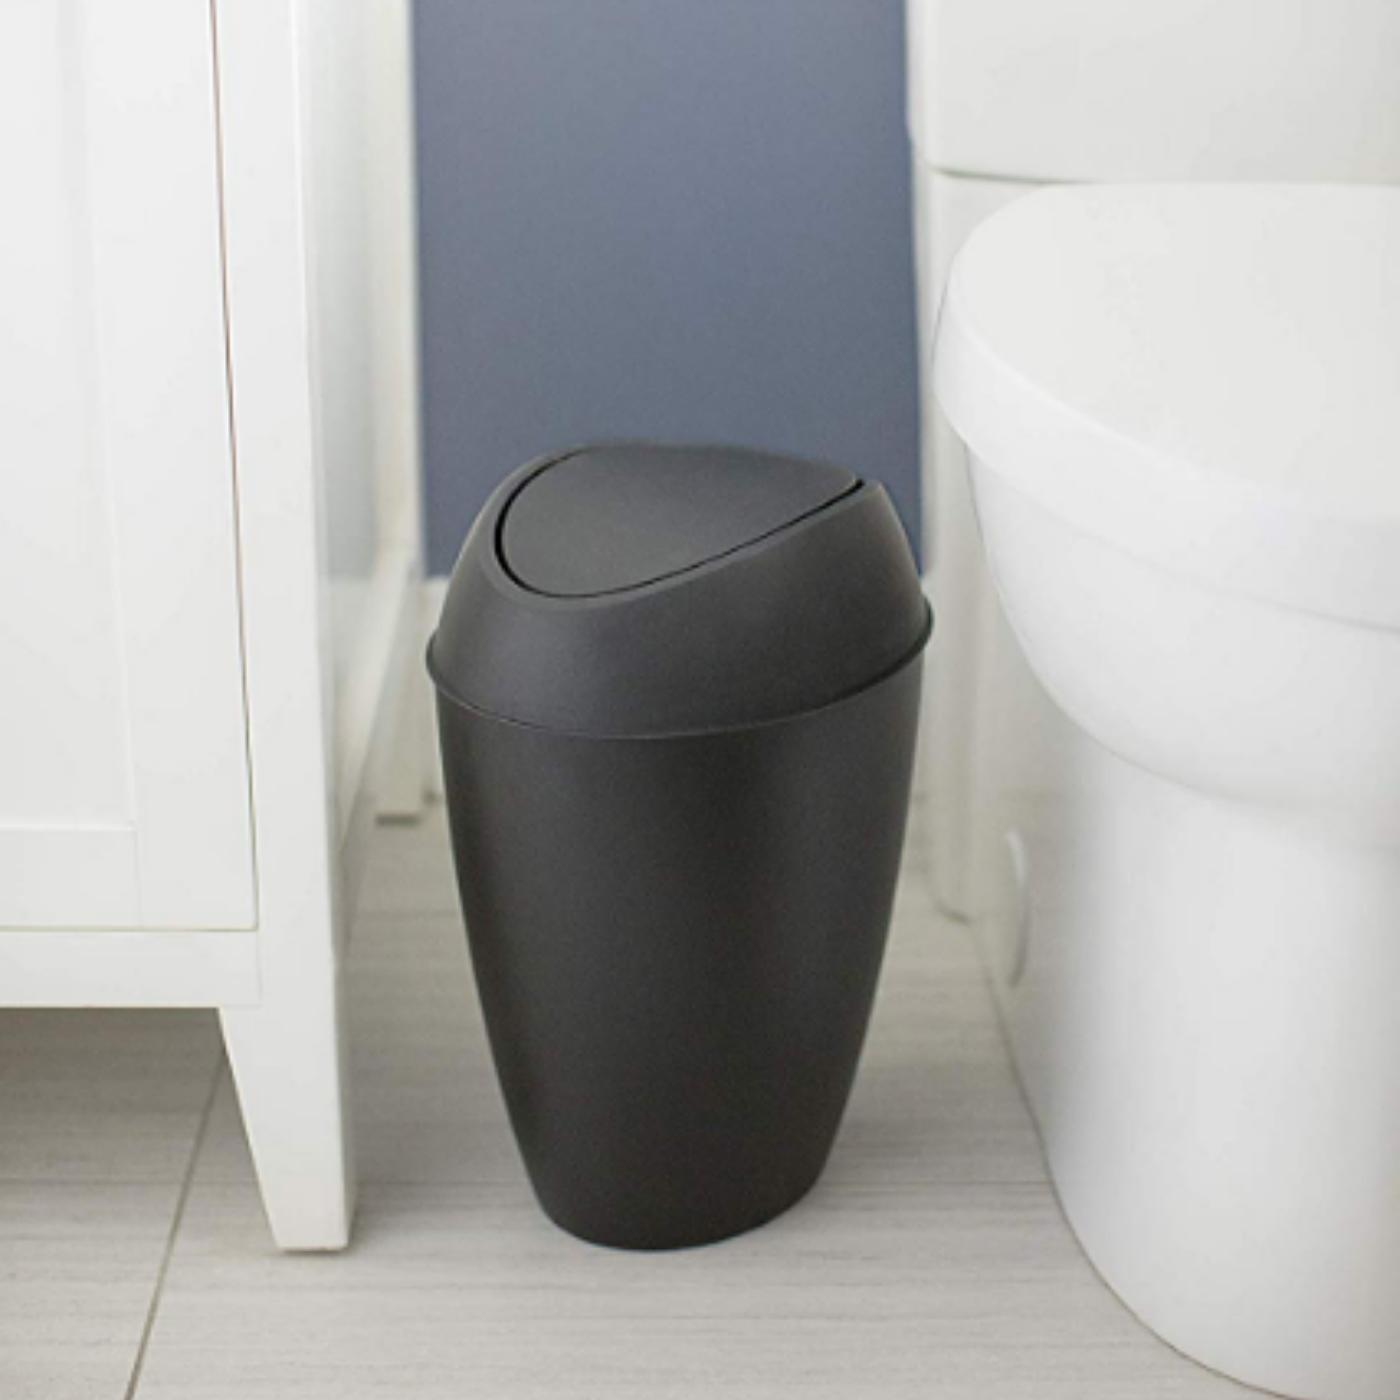 Swing Lid Kitchen Bathroom Office Trash Waste Basket